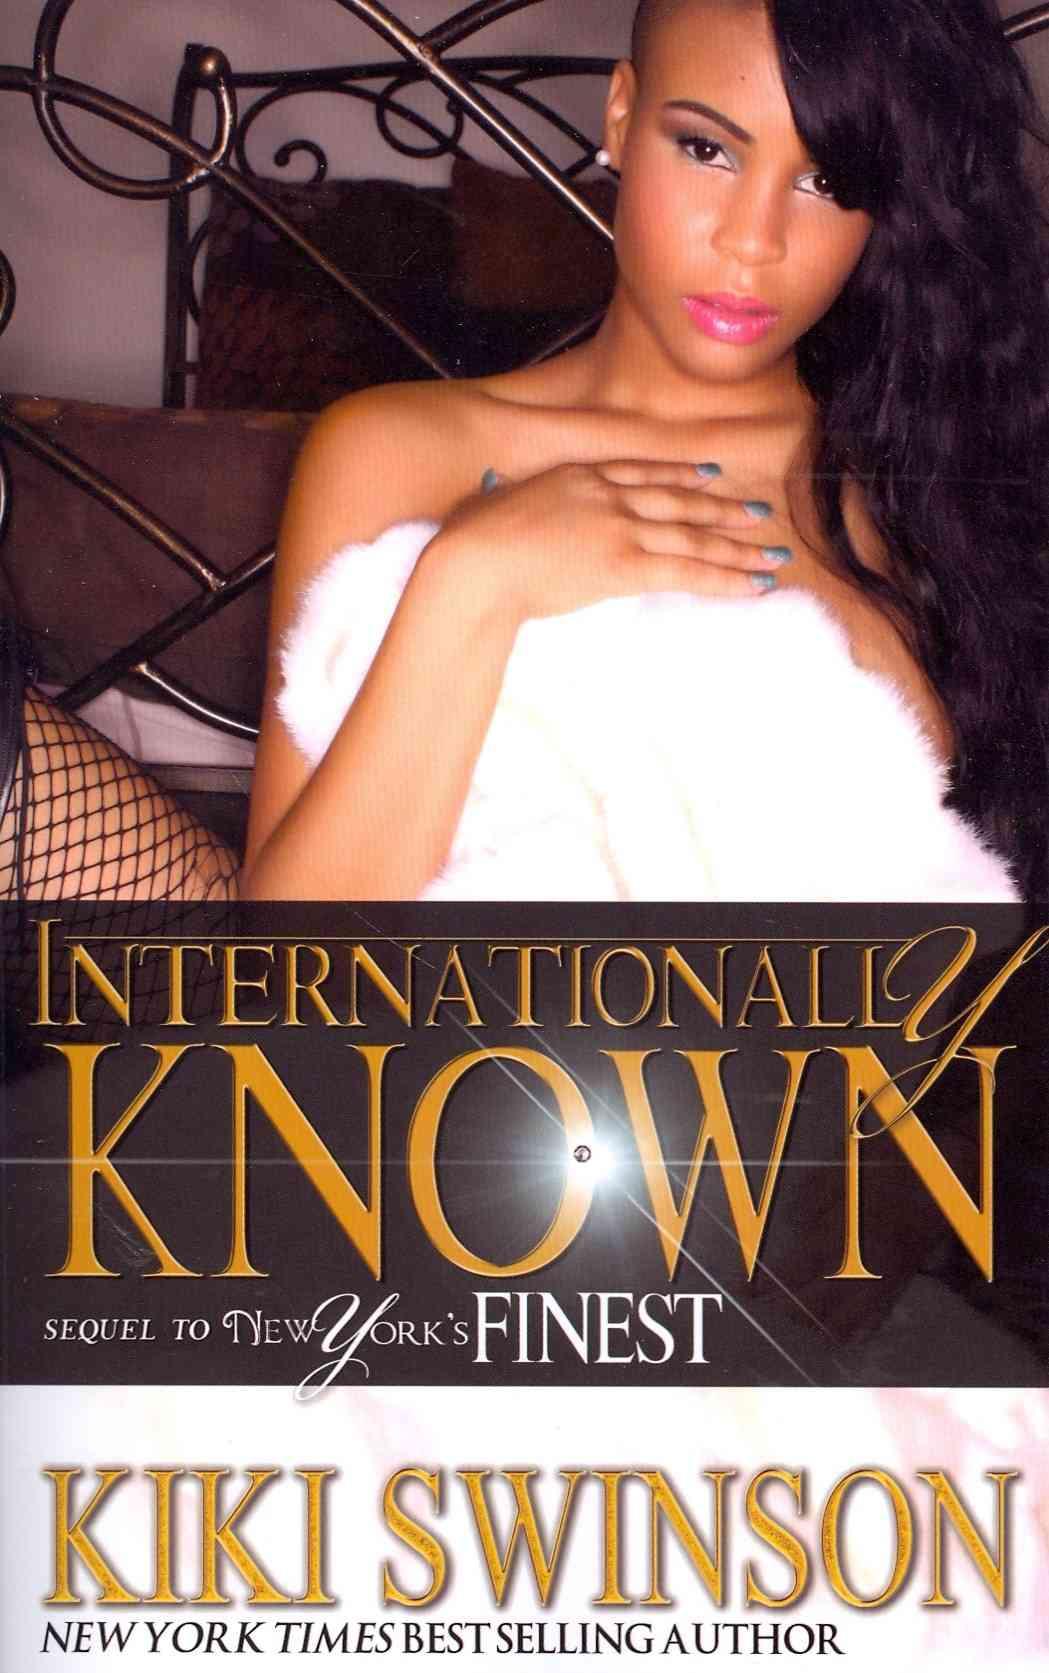 Internationally Known (Paperback)